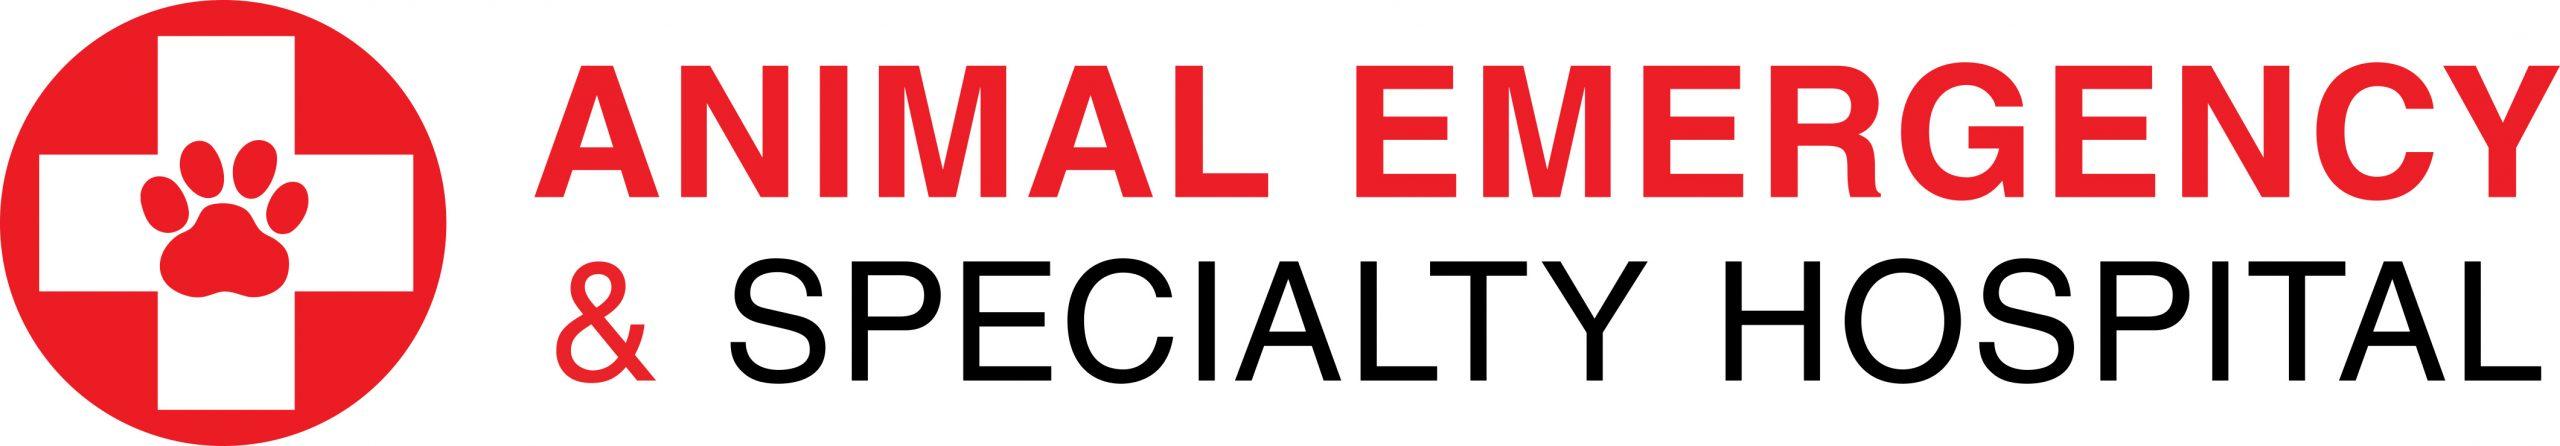 Ottawa Animal Emergency & Specialty Hospital